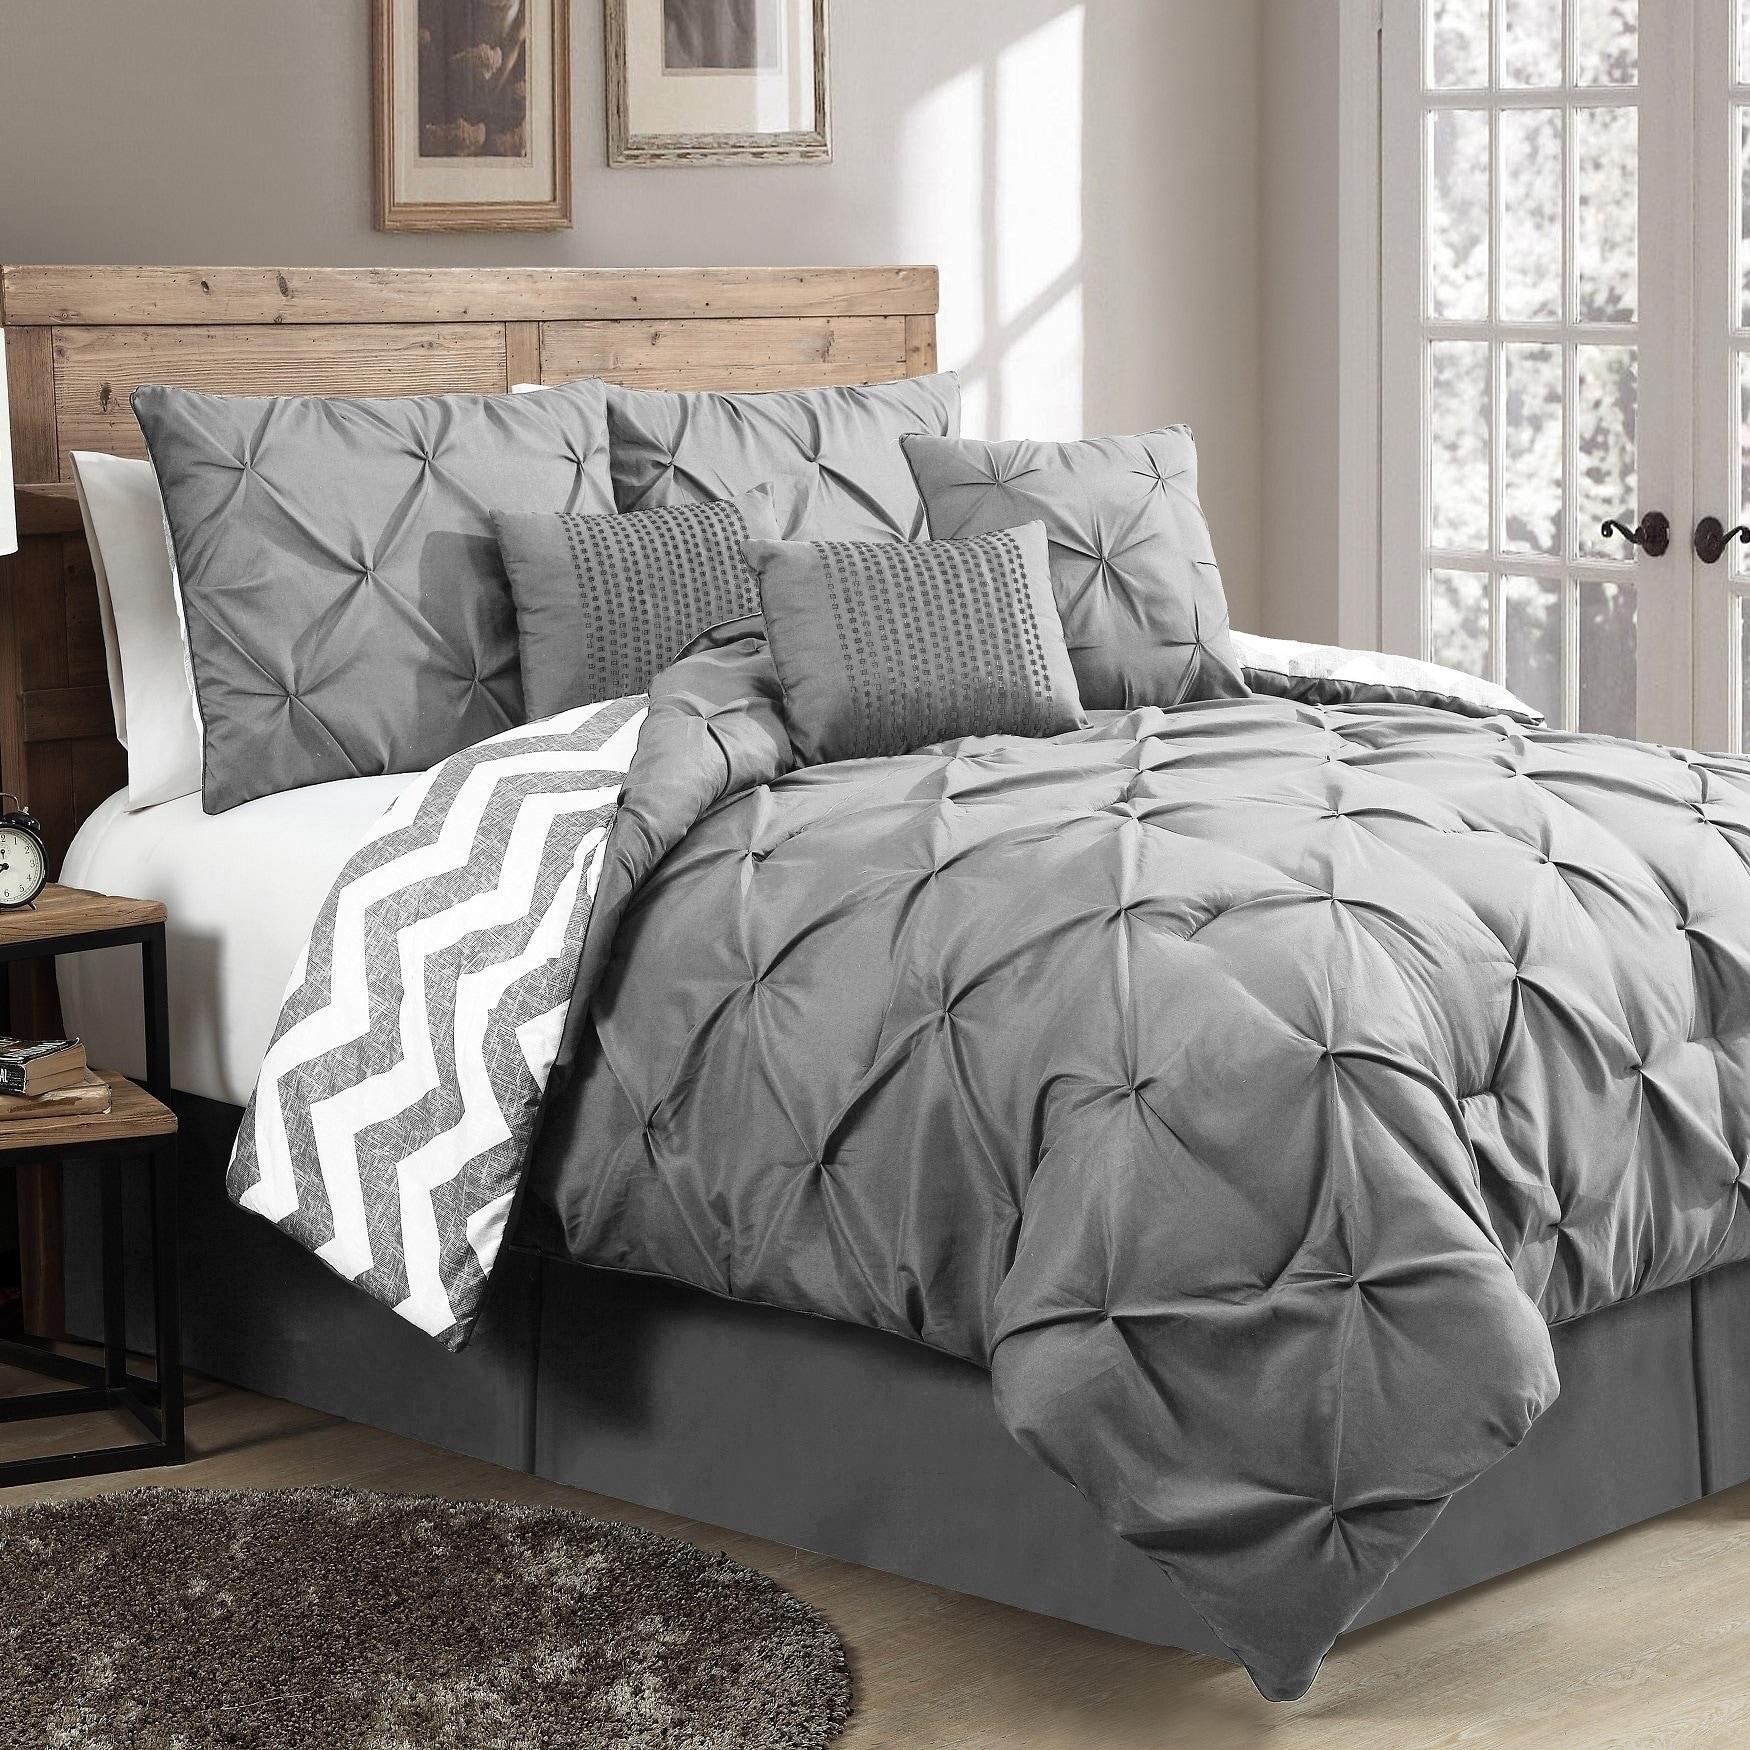 Ella Pinch Pleat Reversible Comforter Set with Throw Pillows (King - Blue)